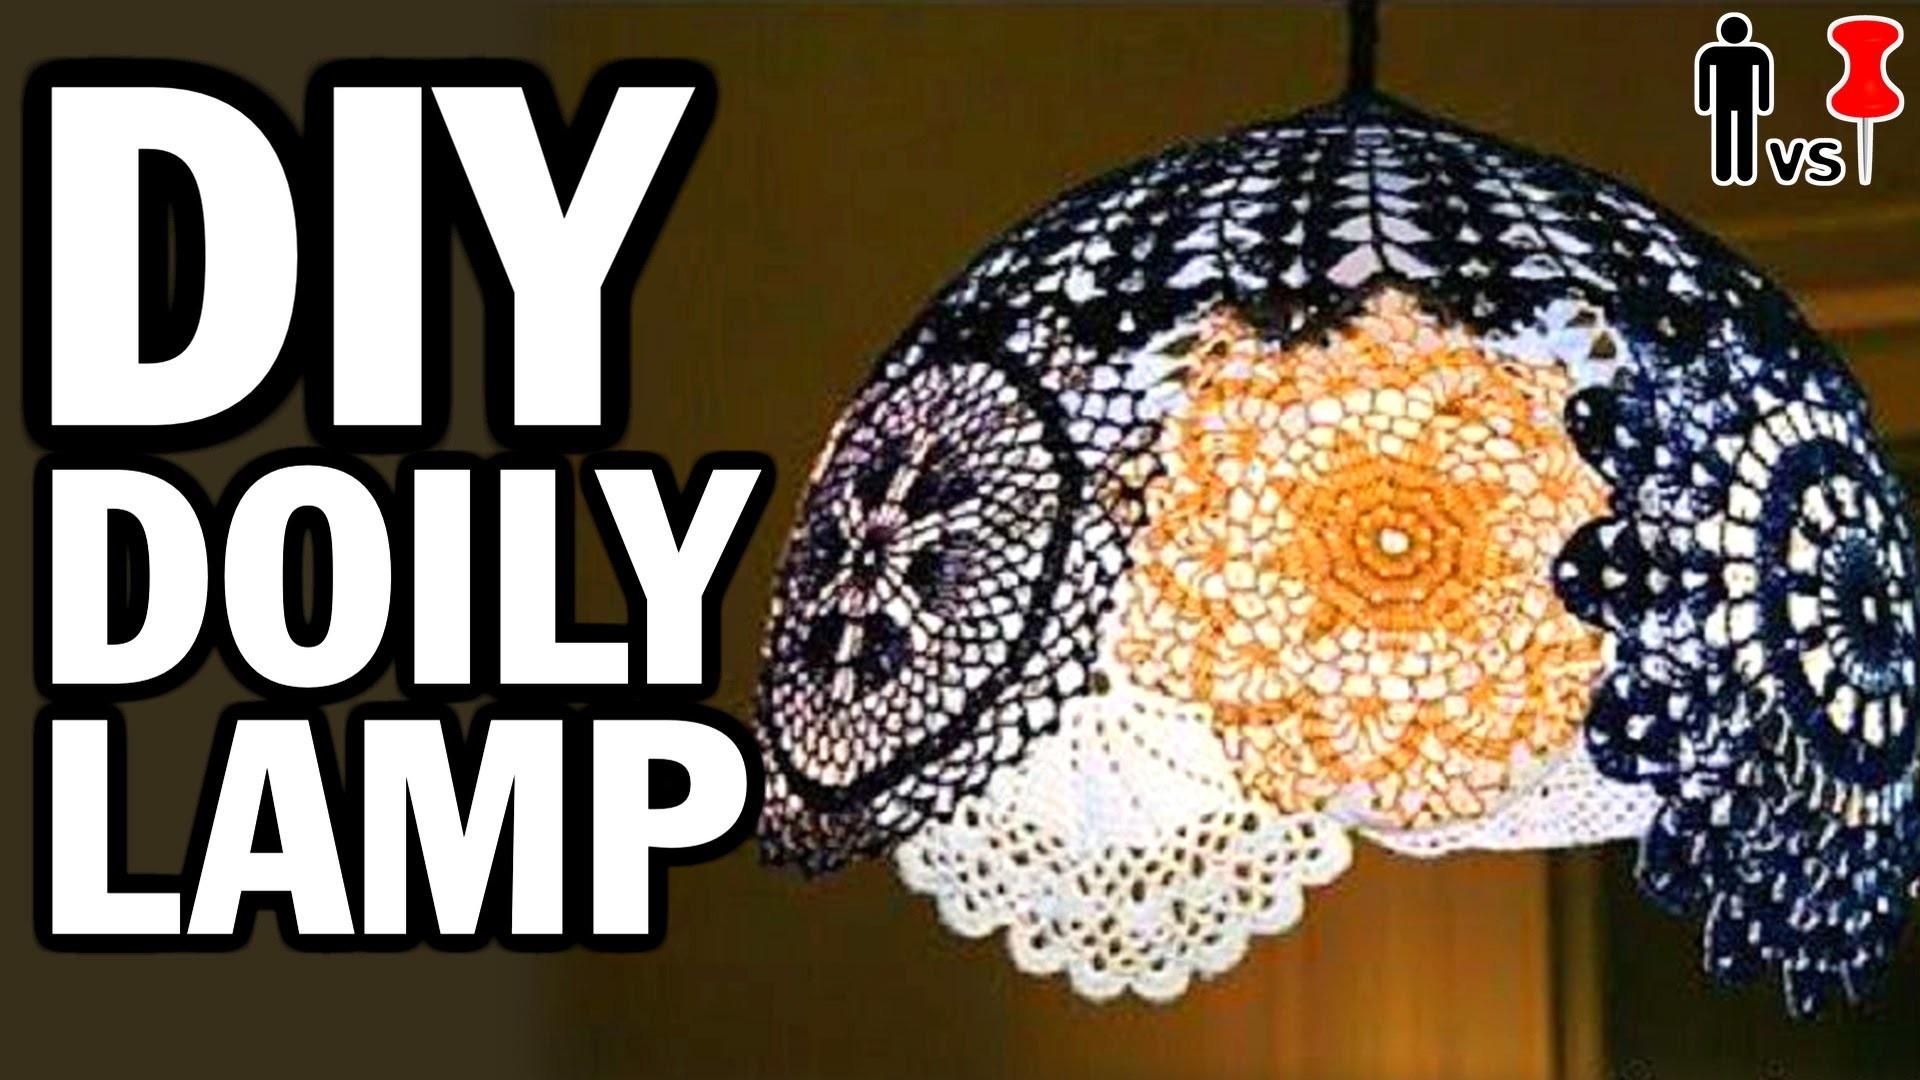 DIY Doily Lamp - Man Vs. Pin - Pinterest Test #44